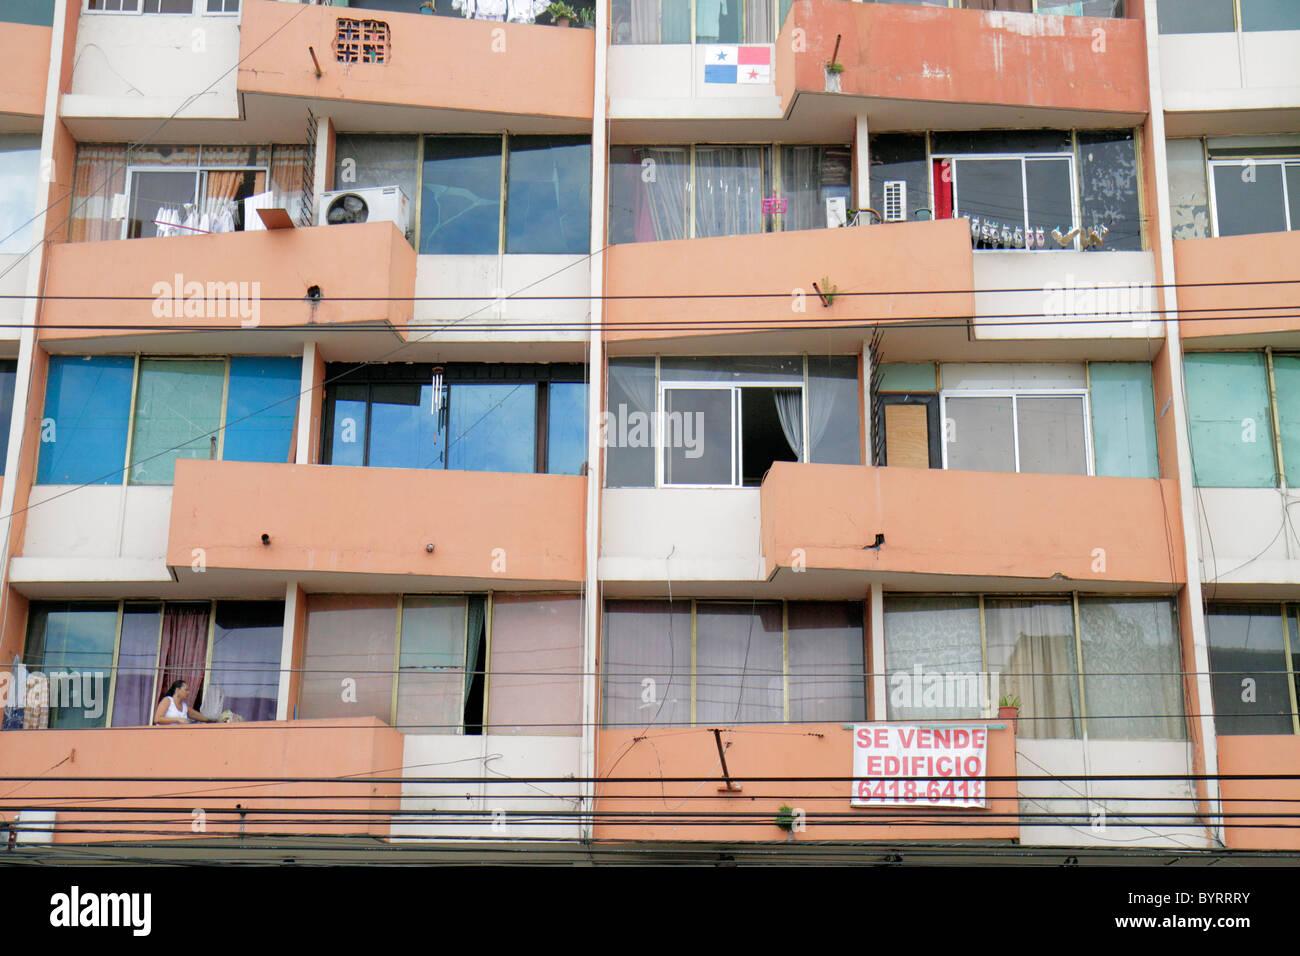 Panama City Panama Bella Vista Via Espana Mehrfamilienhaus heruntergekommenen Baufälligkeit Strom Linien Balkon Stockbild